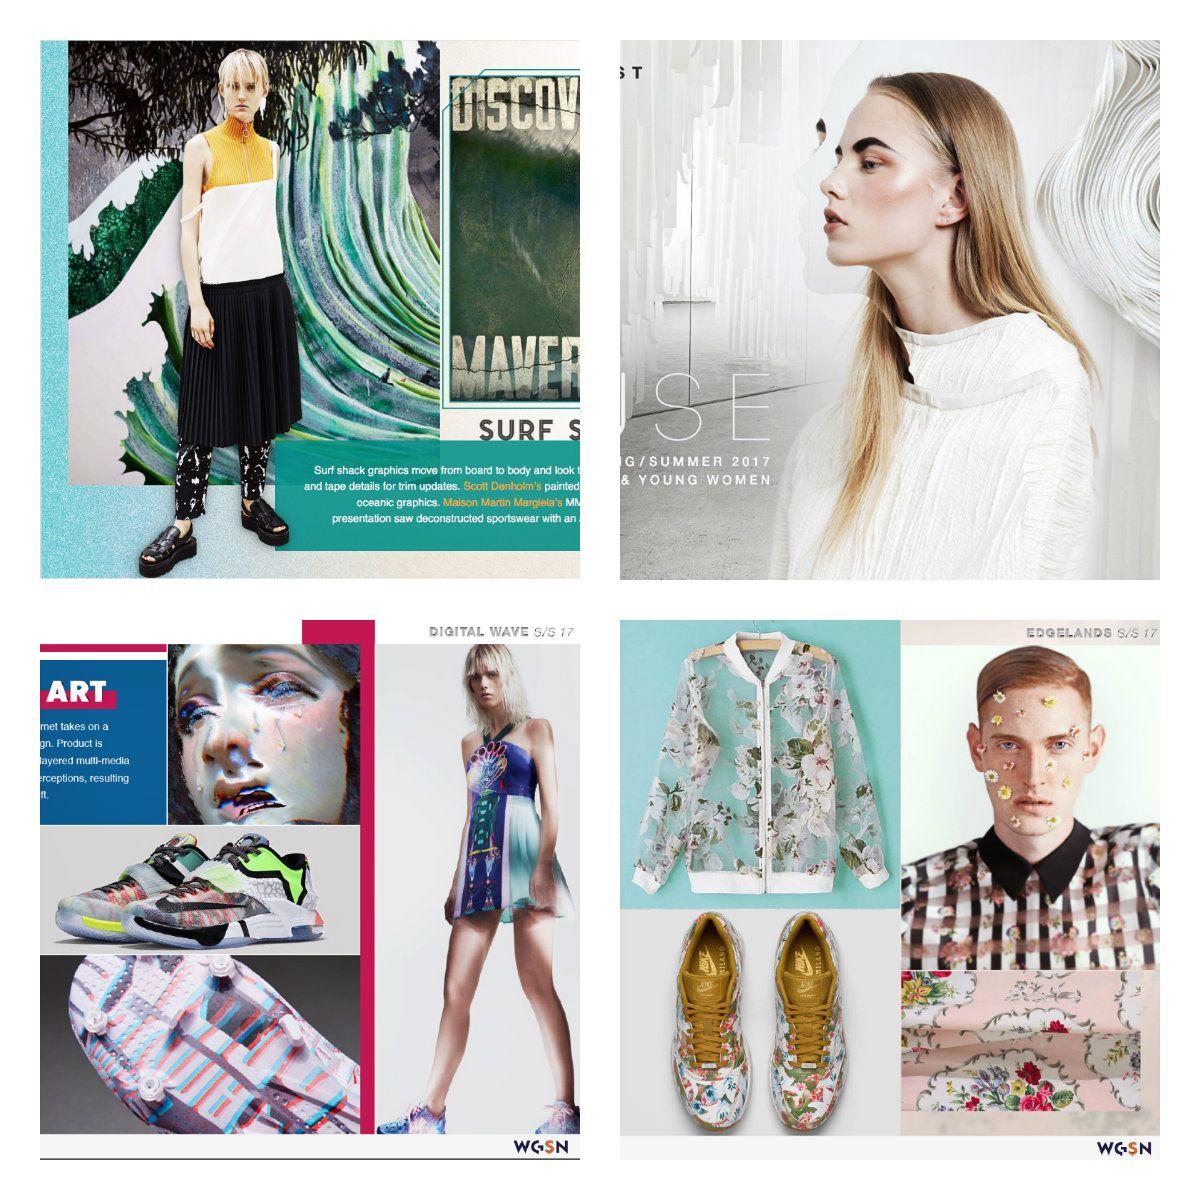 HONG KONG FASHION WEEK - Experts Highlight Four Fashion ...